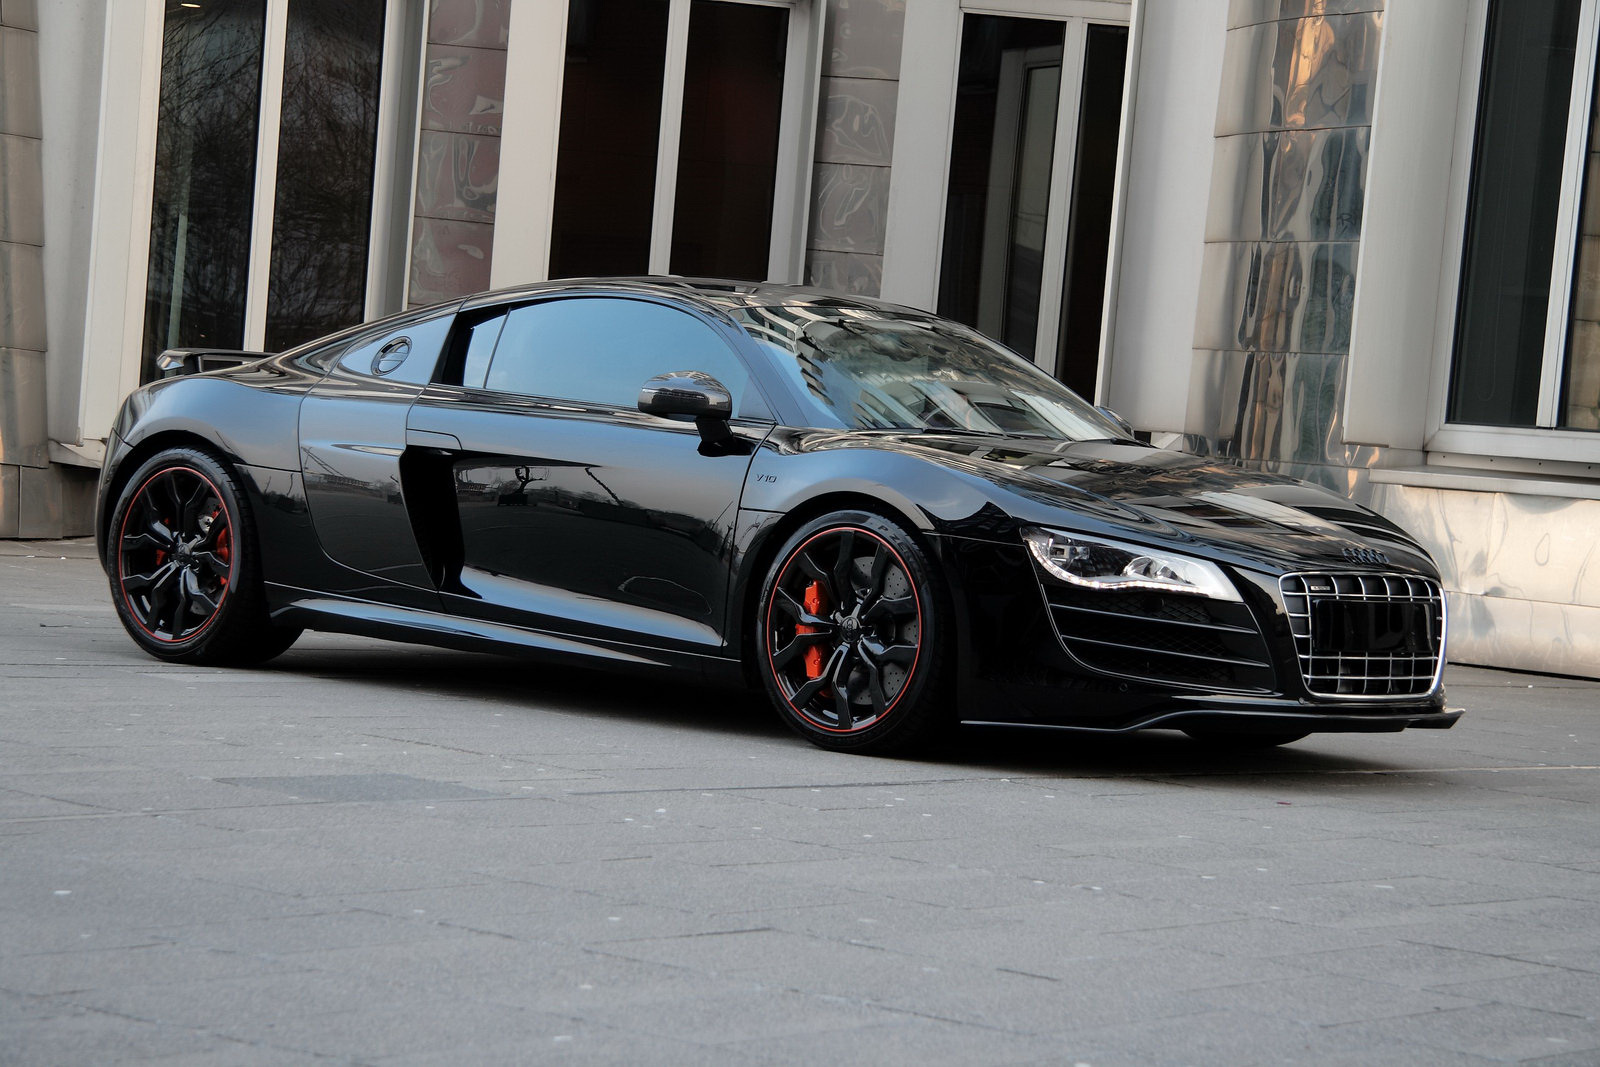 Best Satin Black Paint For Cars